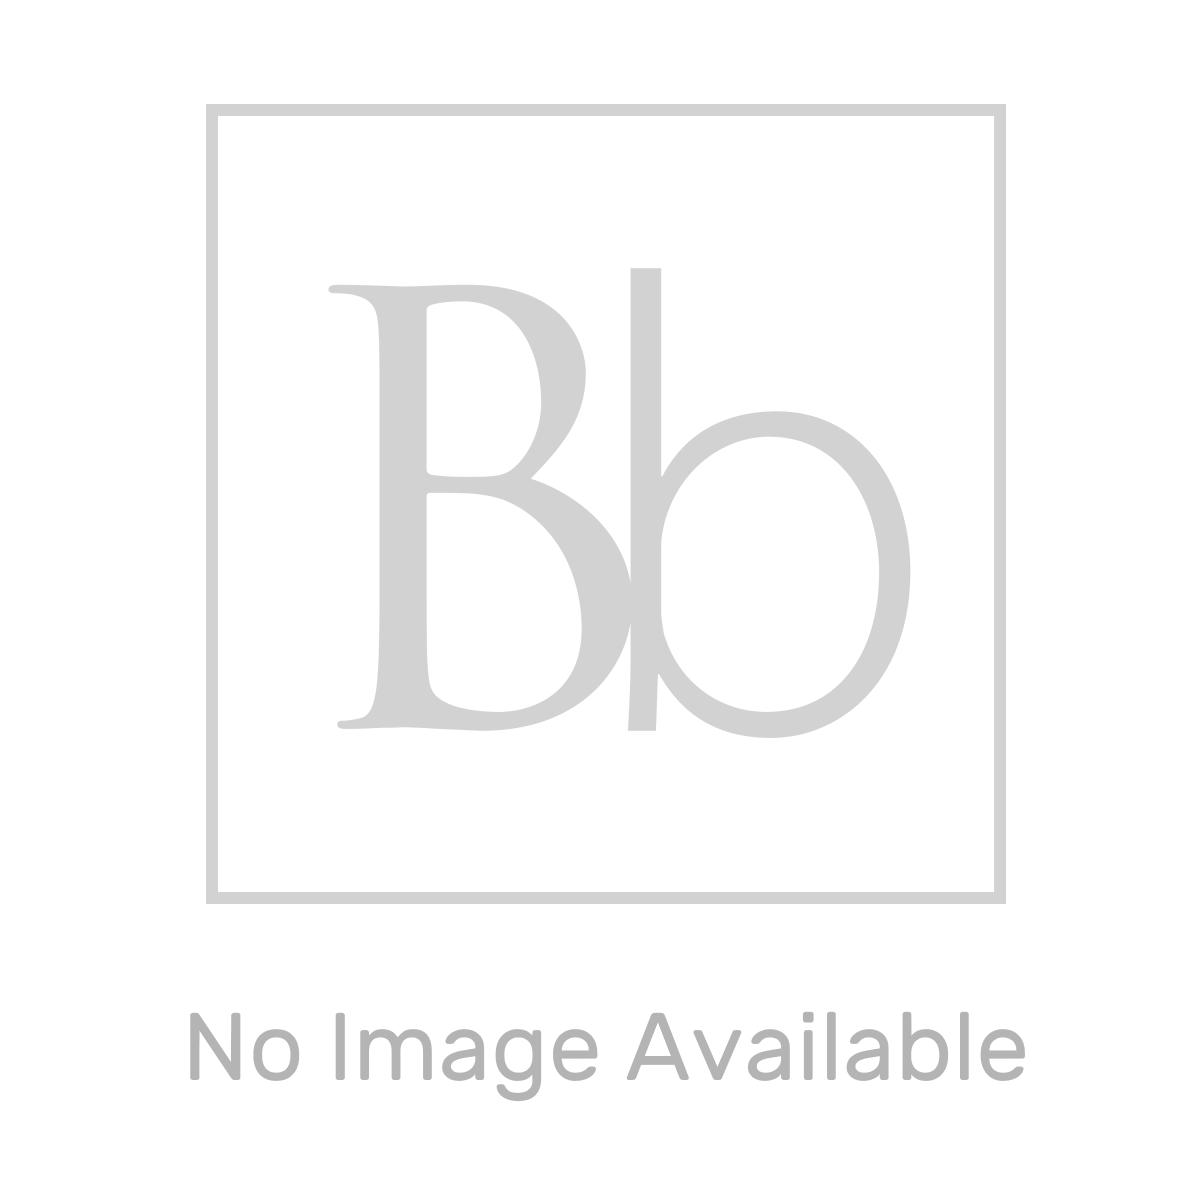 Cassellie Spek 1 Tap Hole Corner Basin with Full Pedestal Drawing